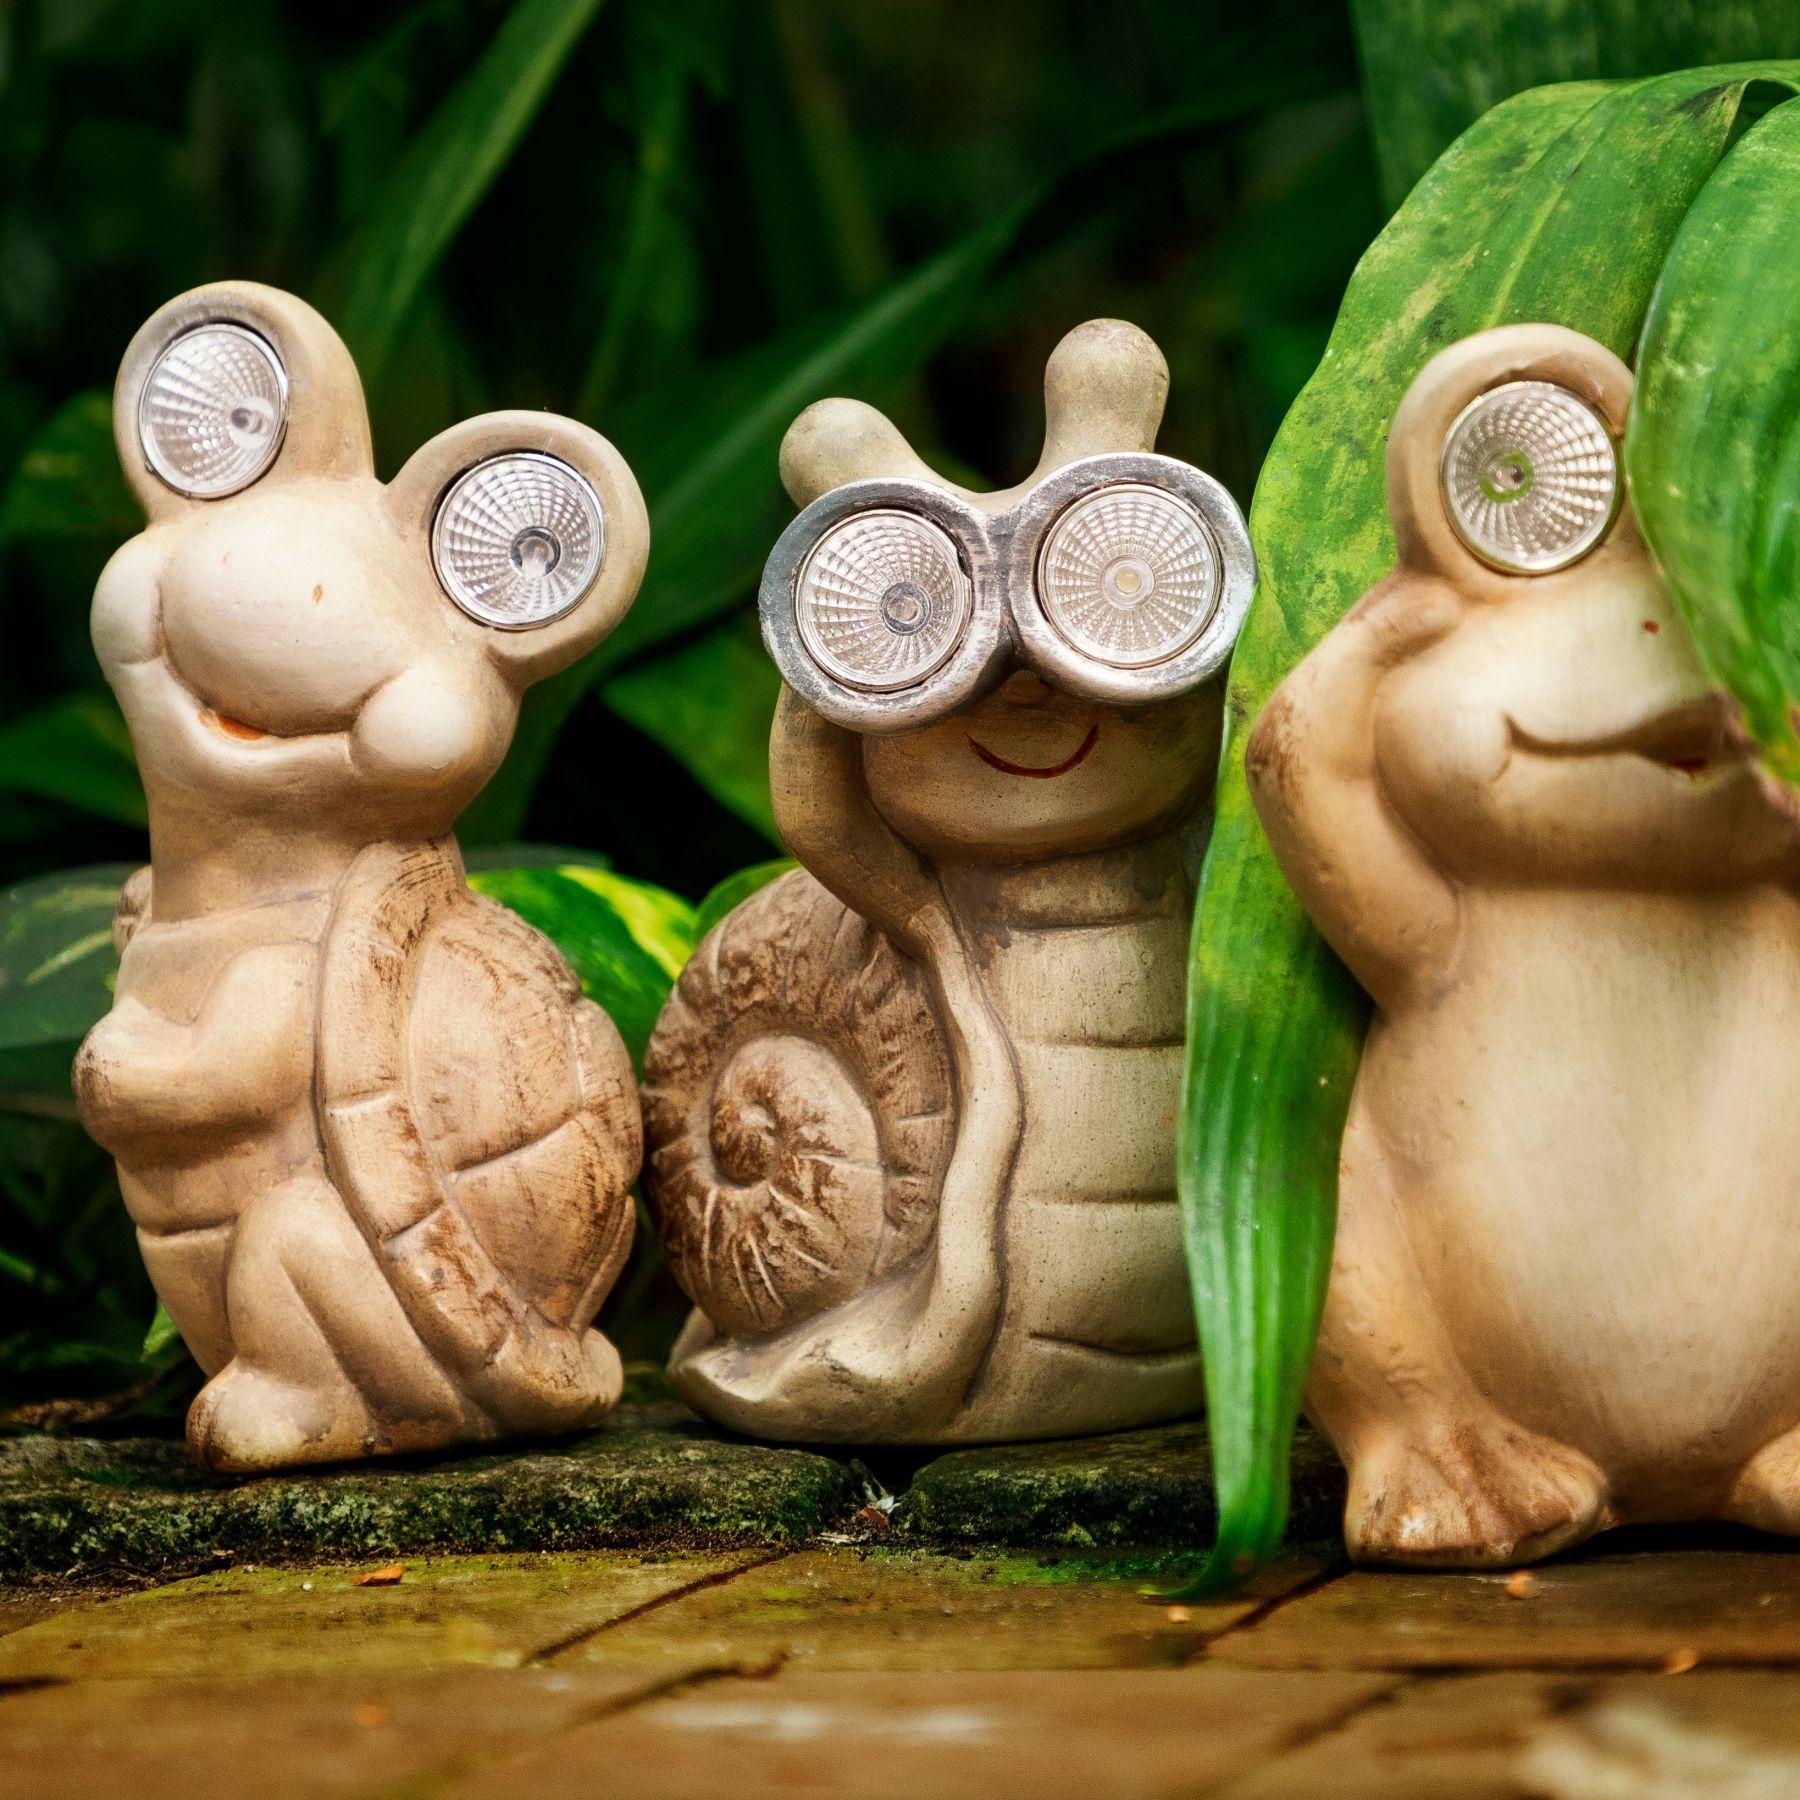 Solar Tiere Fur Den Garten Balkon Nanu Nana Licht In Der Dunkelheit Figur Deko Vogel